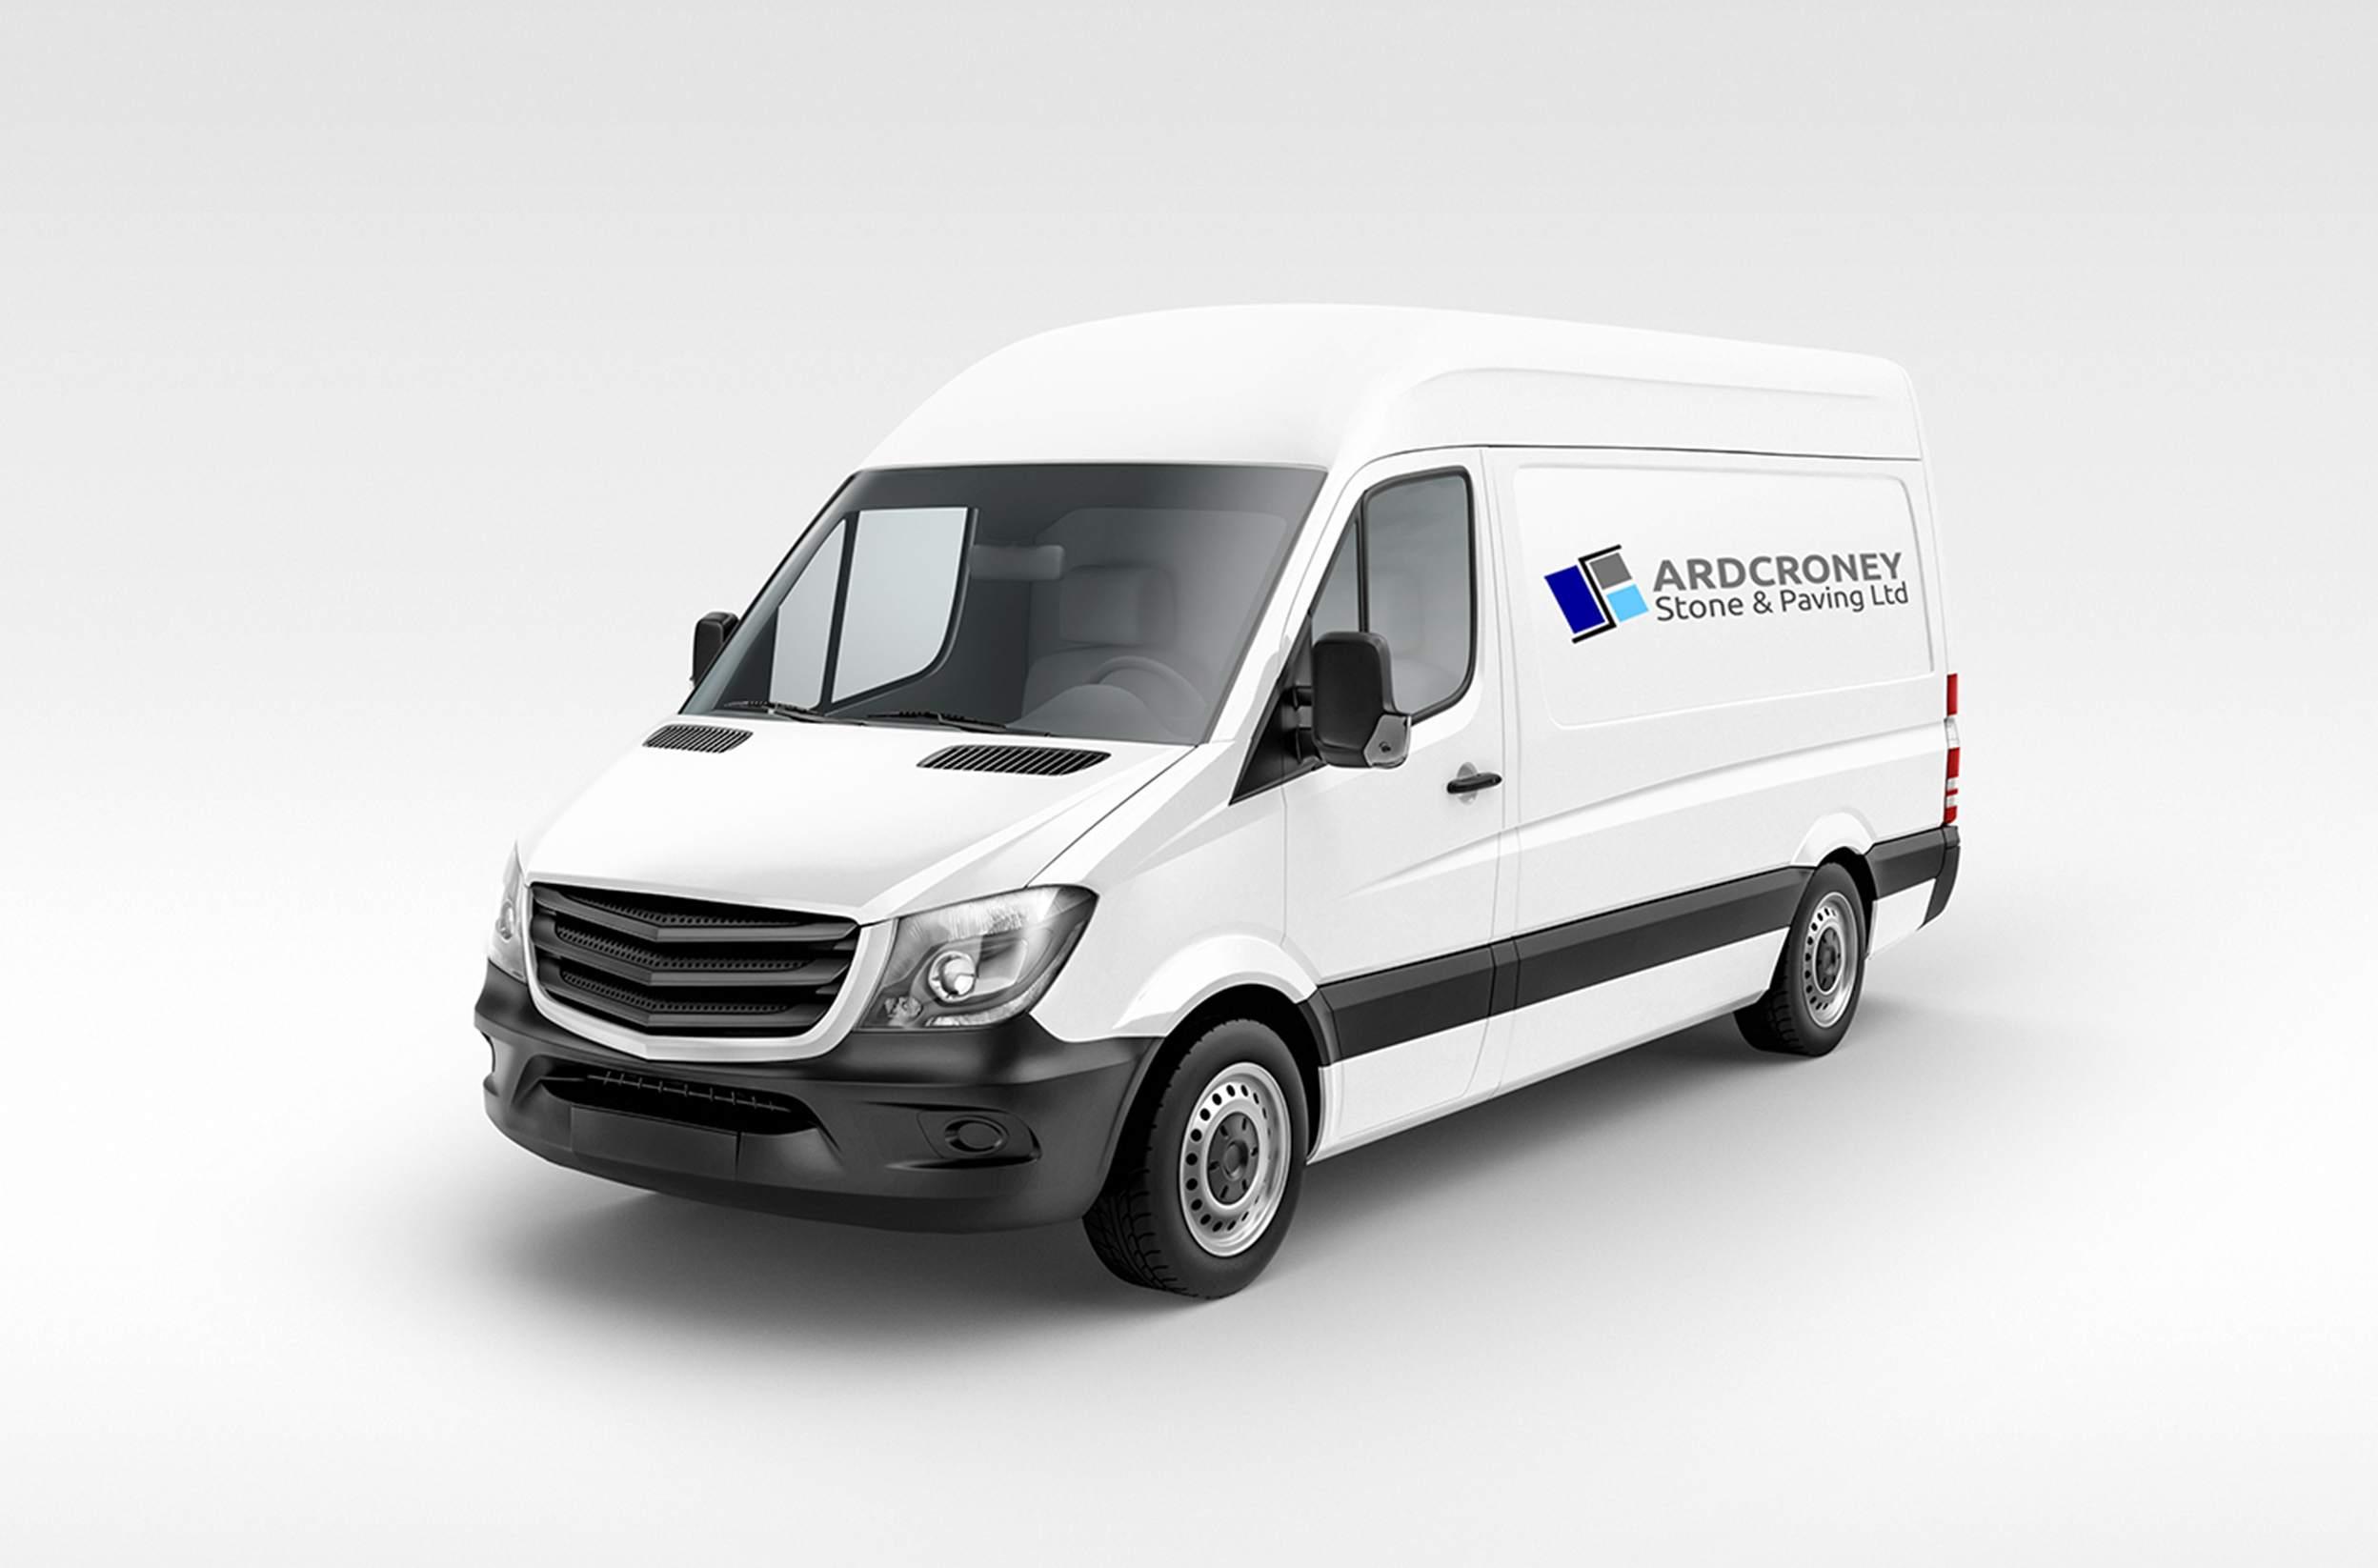 BEHANCE_ardcroney_vehicle